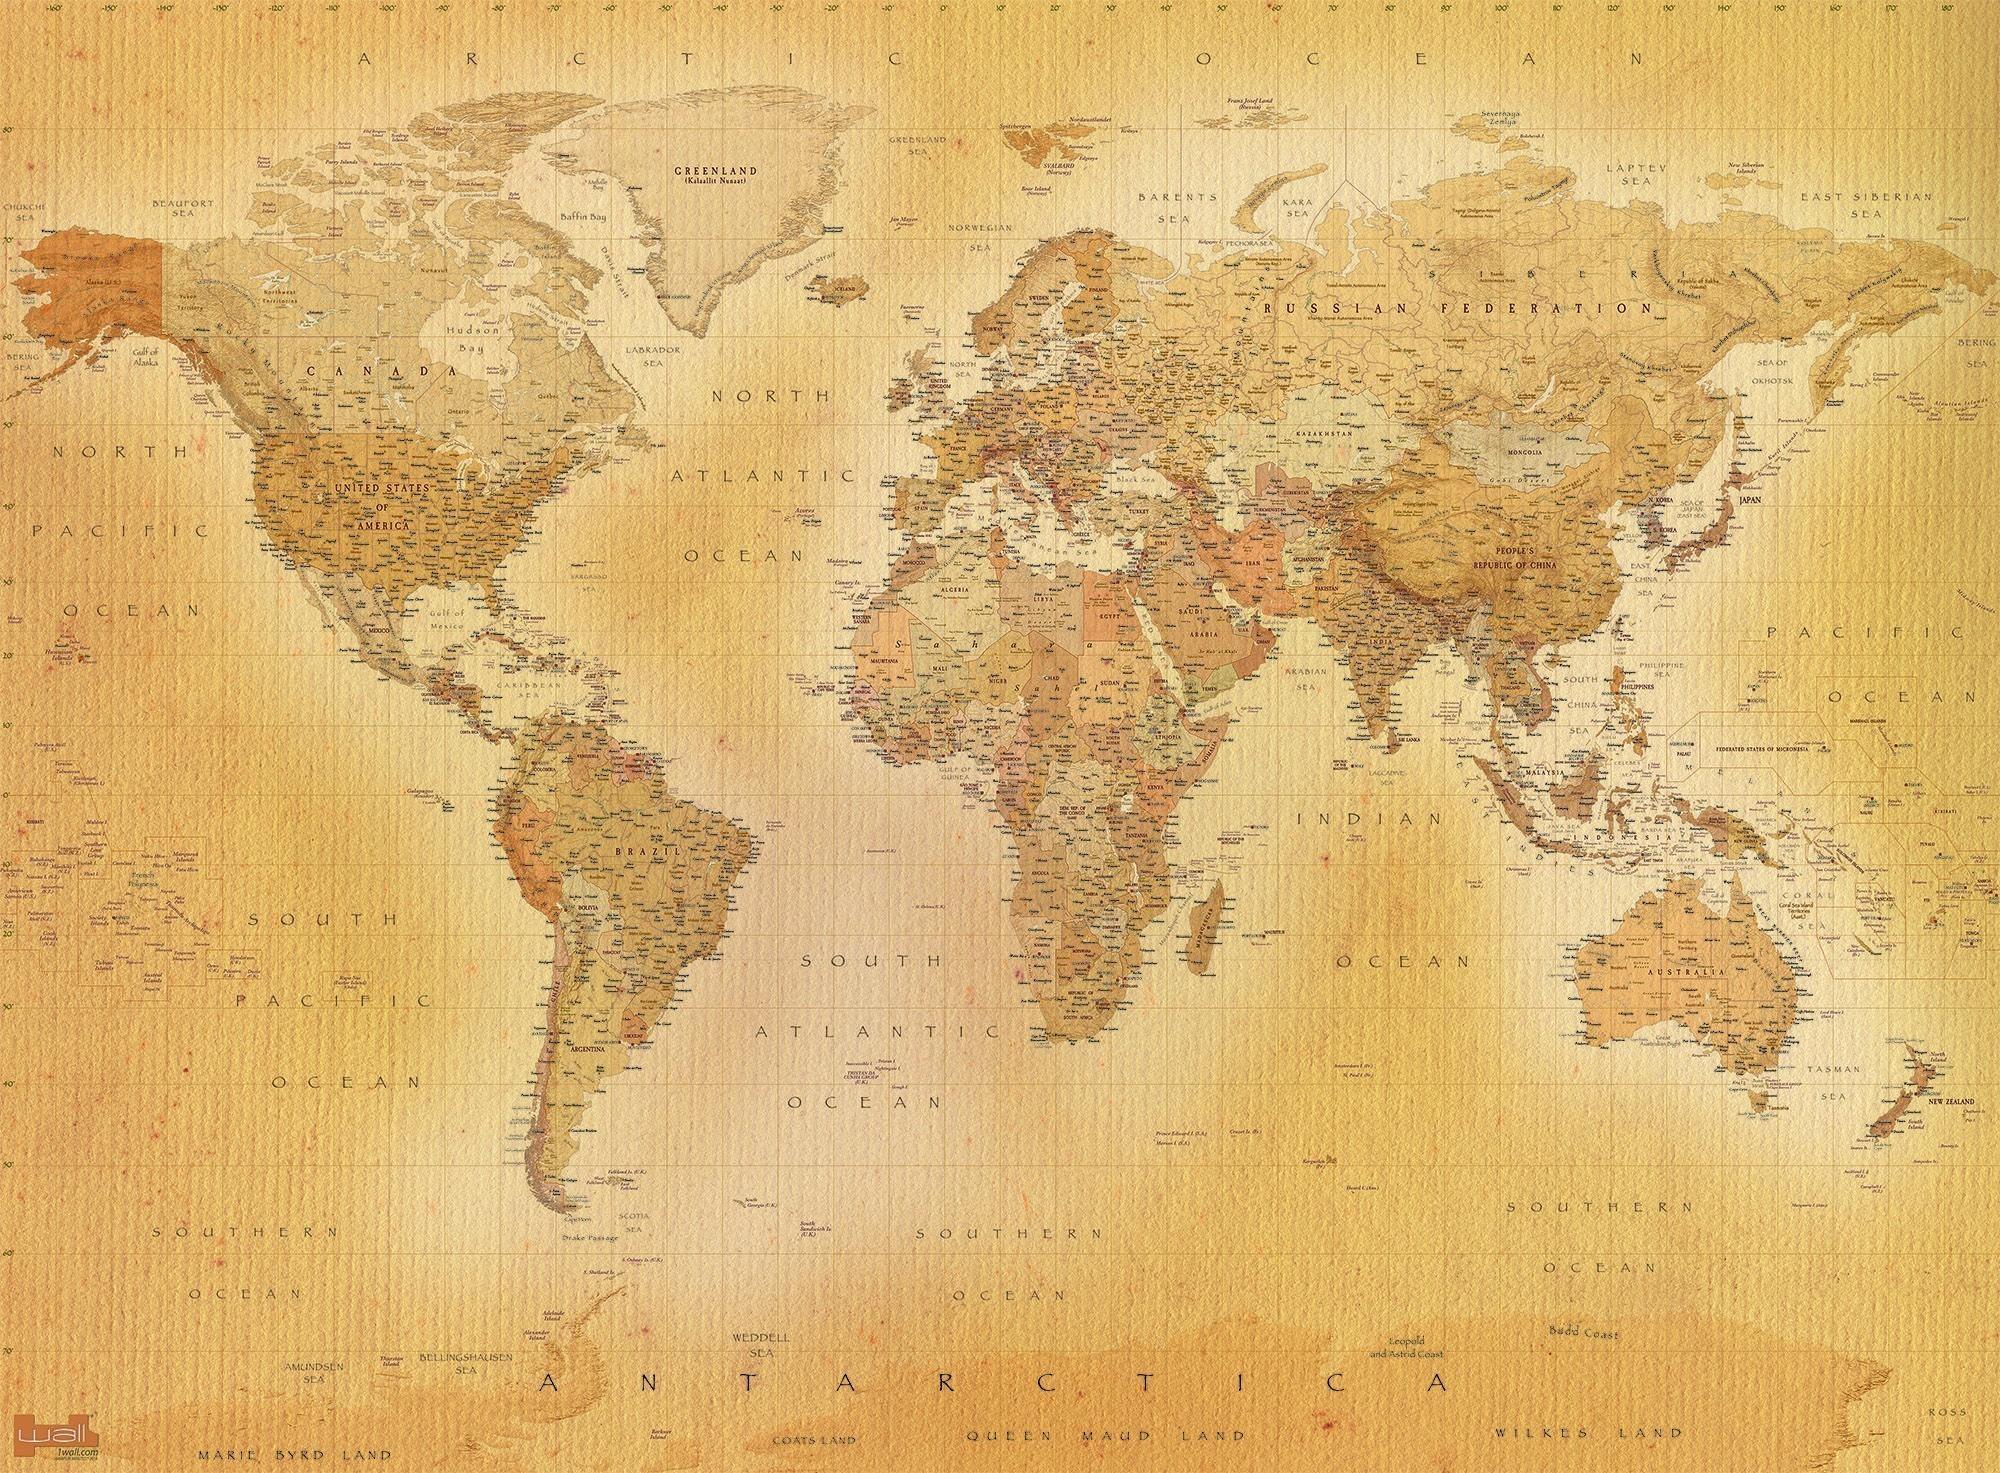 Res: 2000x1473, Old World Map Images Save Vintage World Map Wallpaper Hd New World Map Old  Wallpaper New Old